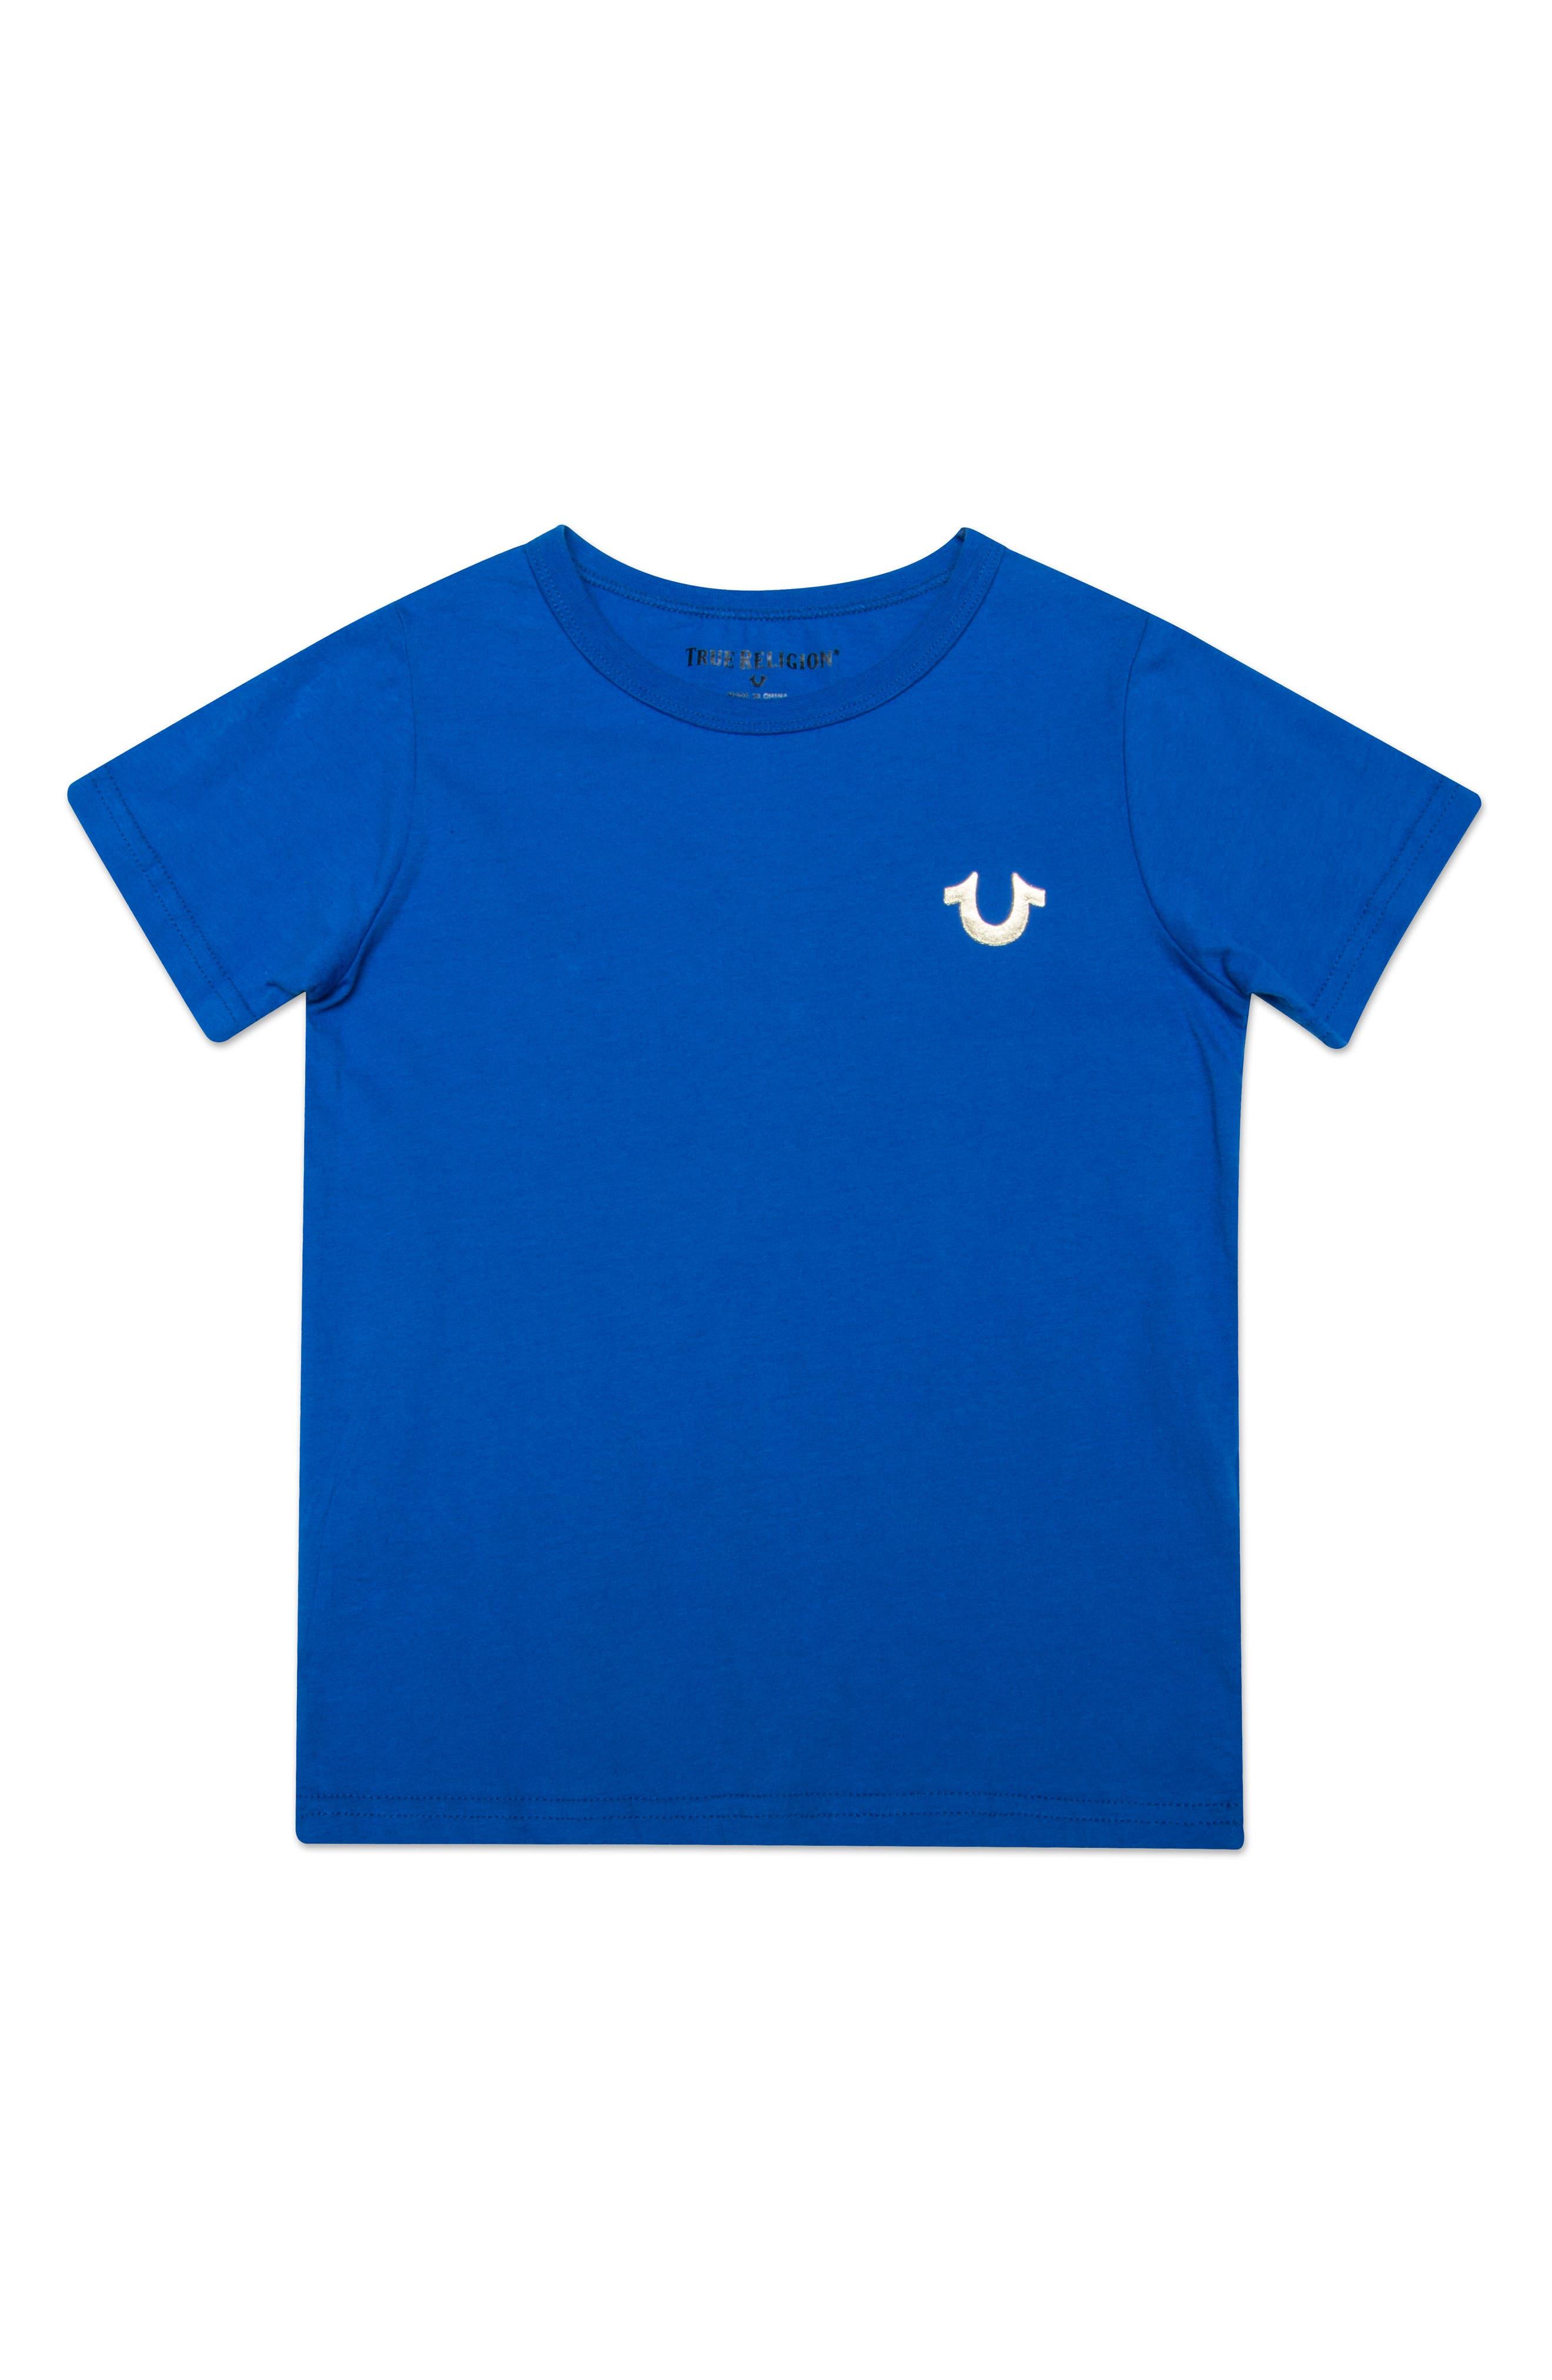 Main Image - True Religion Brand Jeans Gold Buddha Logo T-Shirt (Toddler Boys, Little Boys & Big Boys)